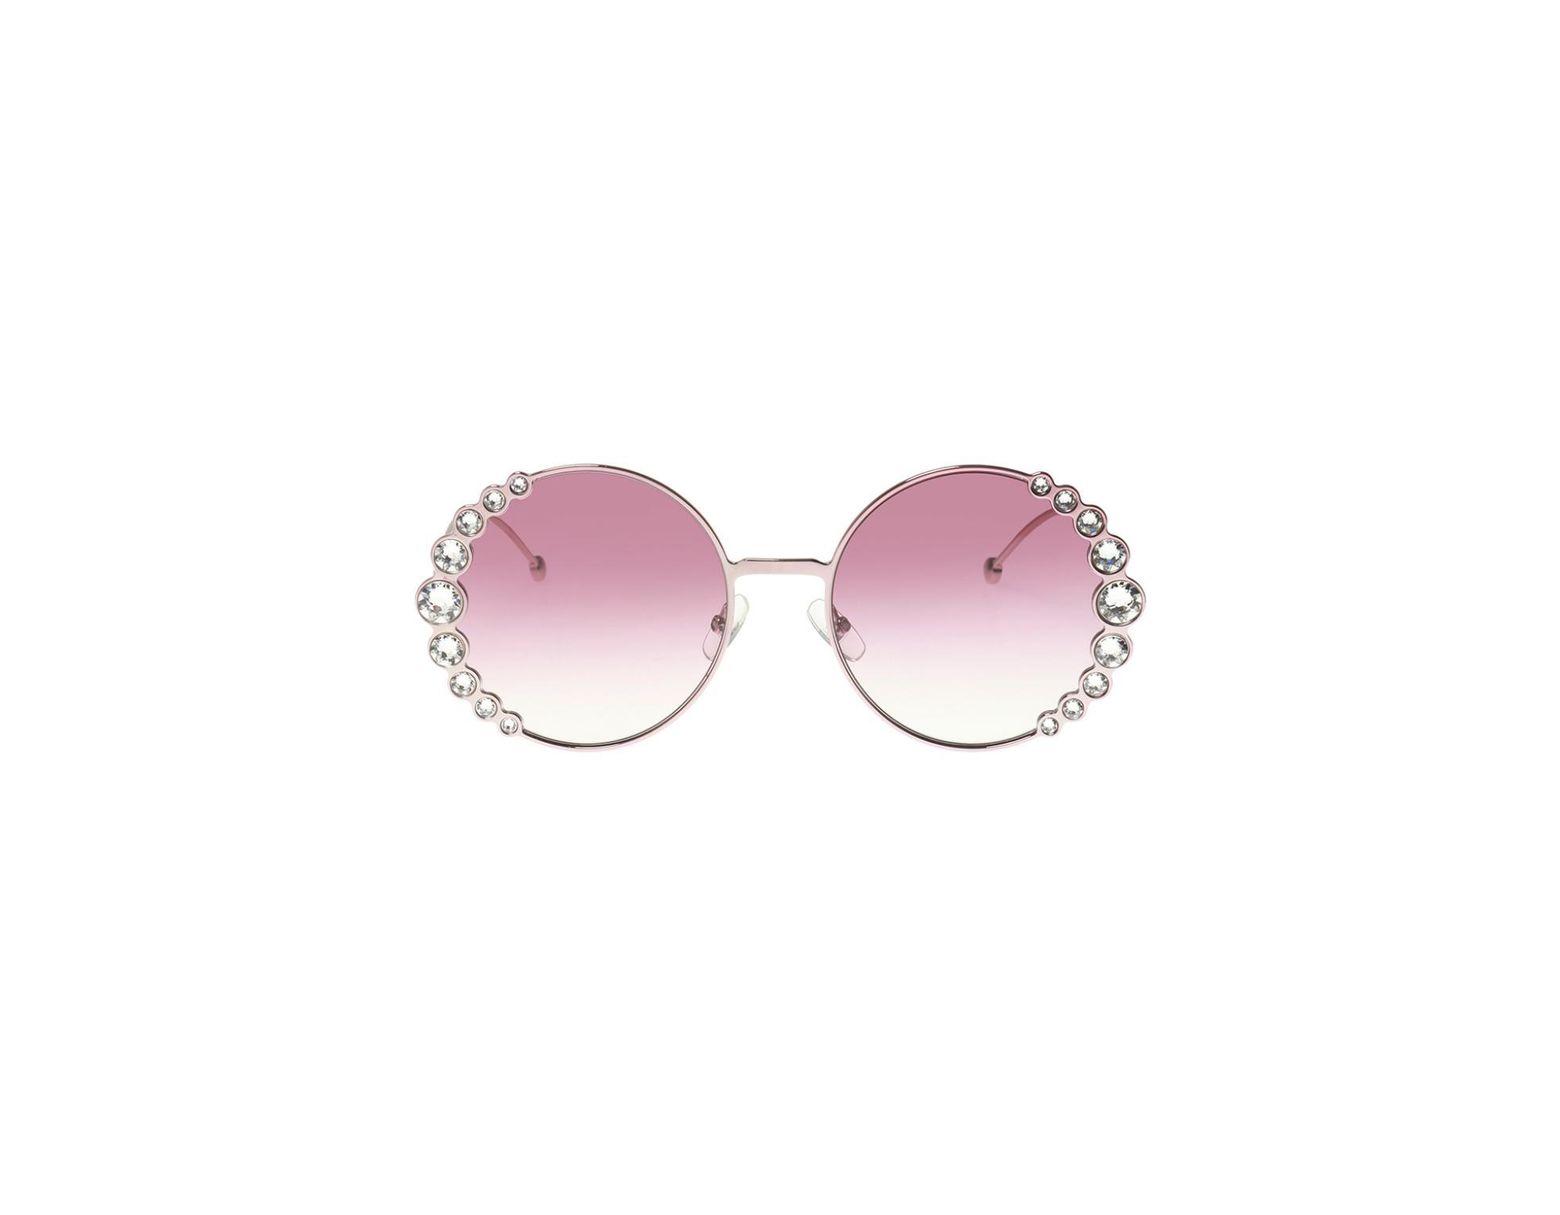 d3b7db06f6991 Lyst - Fendi Ribbons   Crystals Sunglasses in Pink - Save 12%